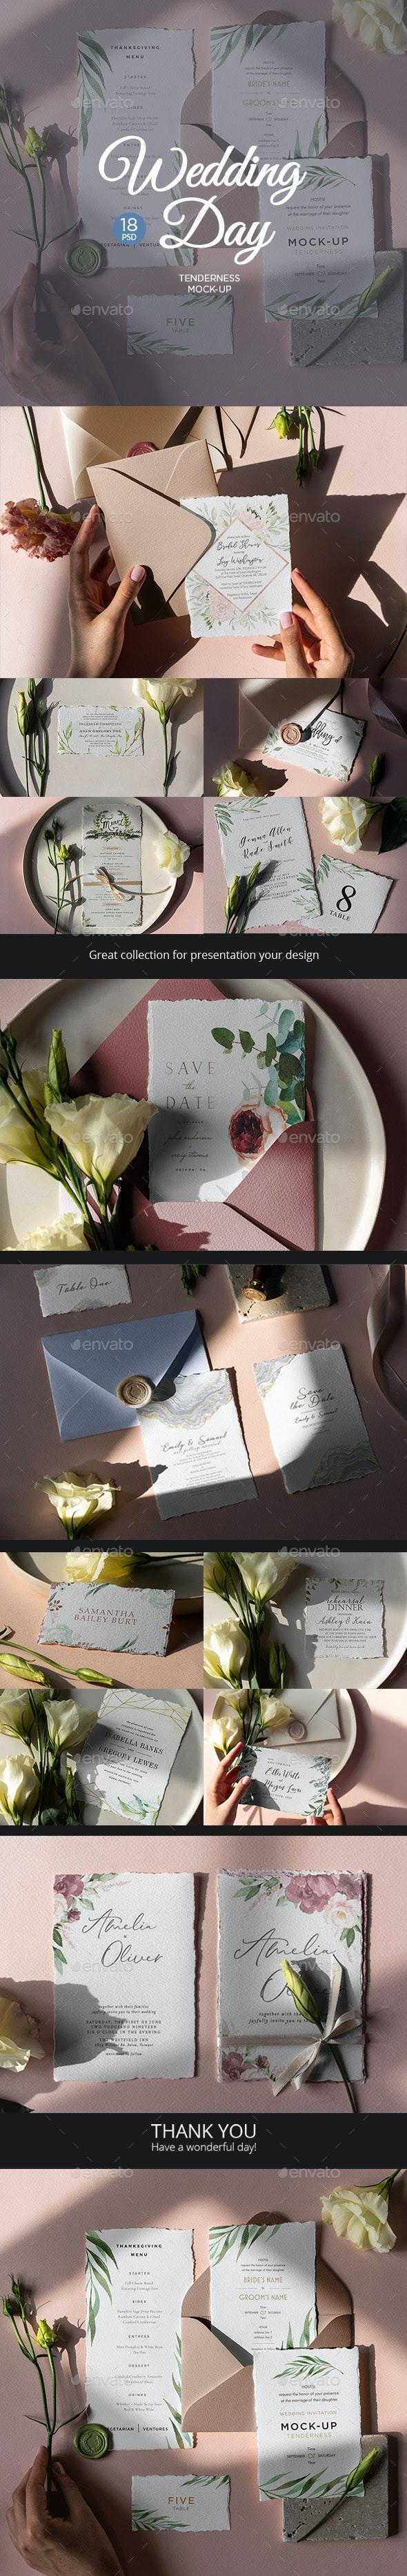 Wedding Day Mock-Up Tenderness - Stationery Print